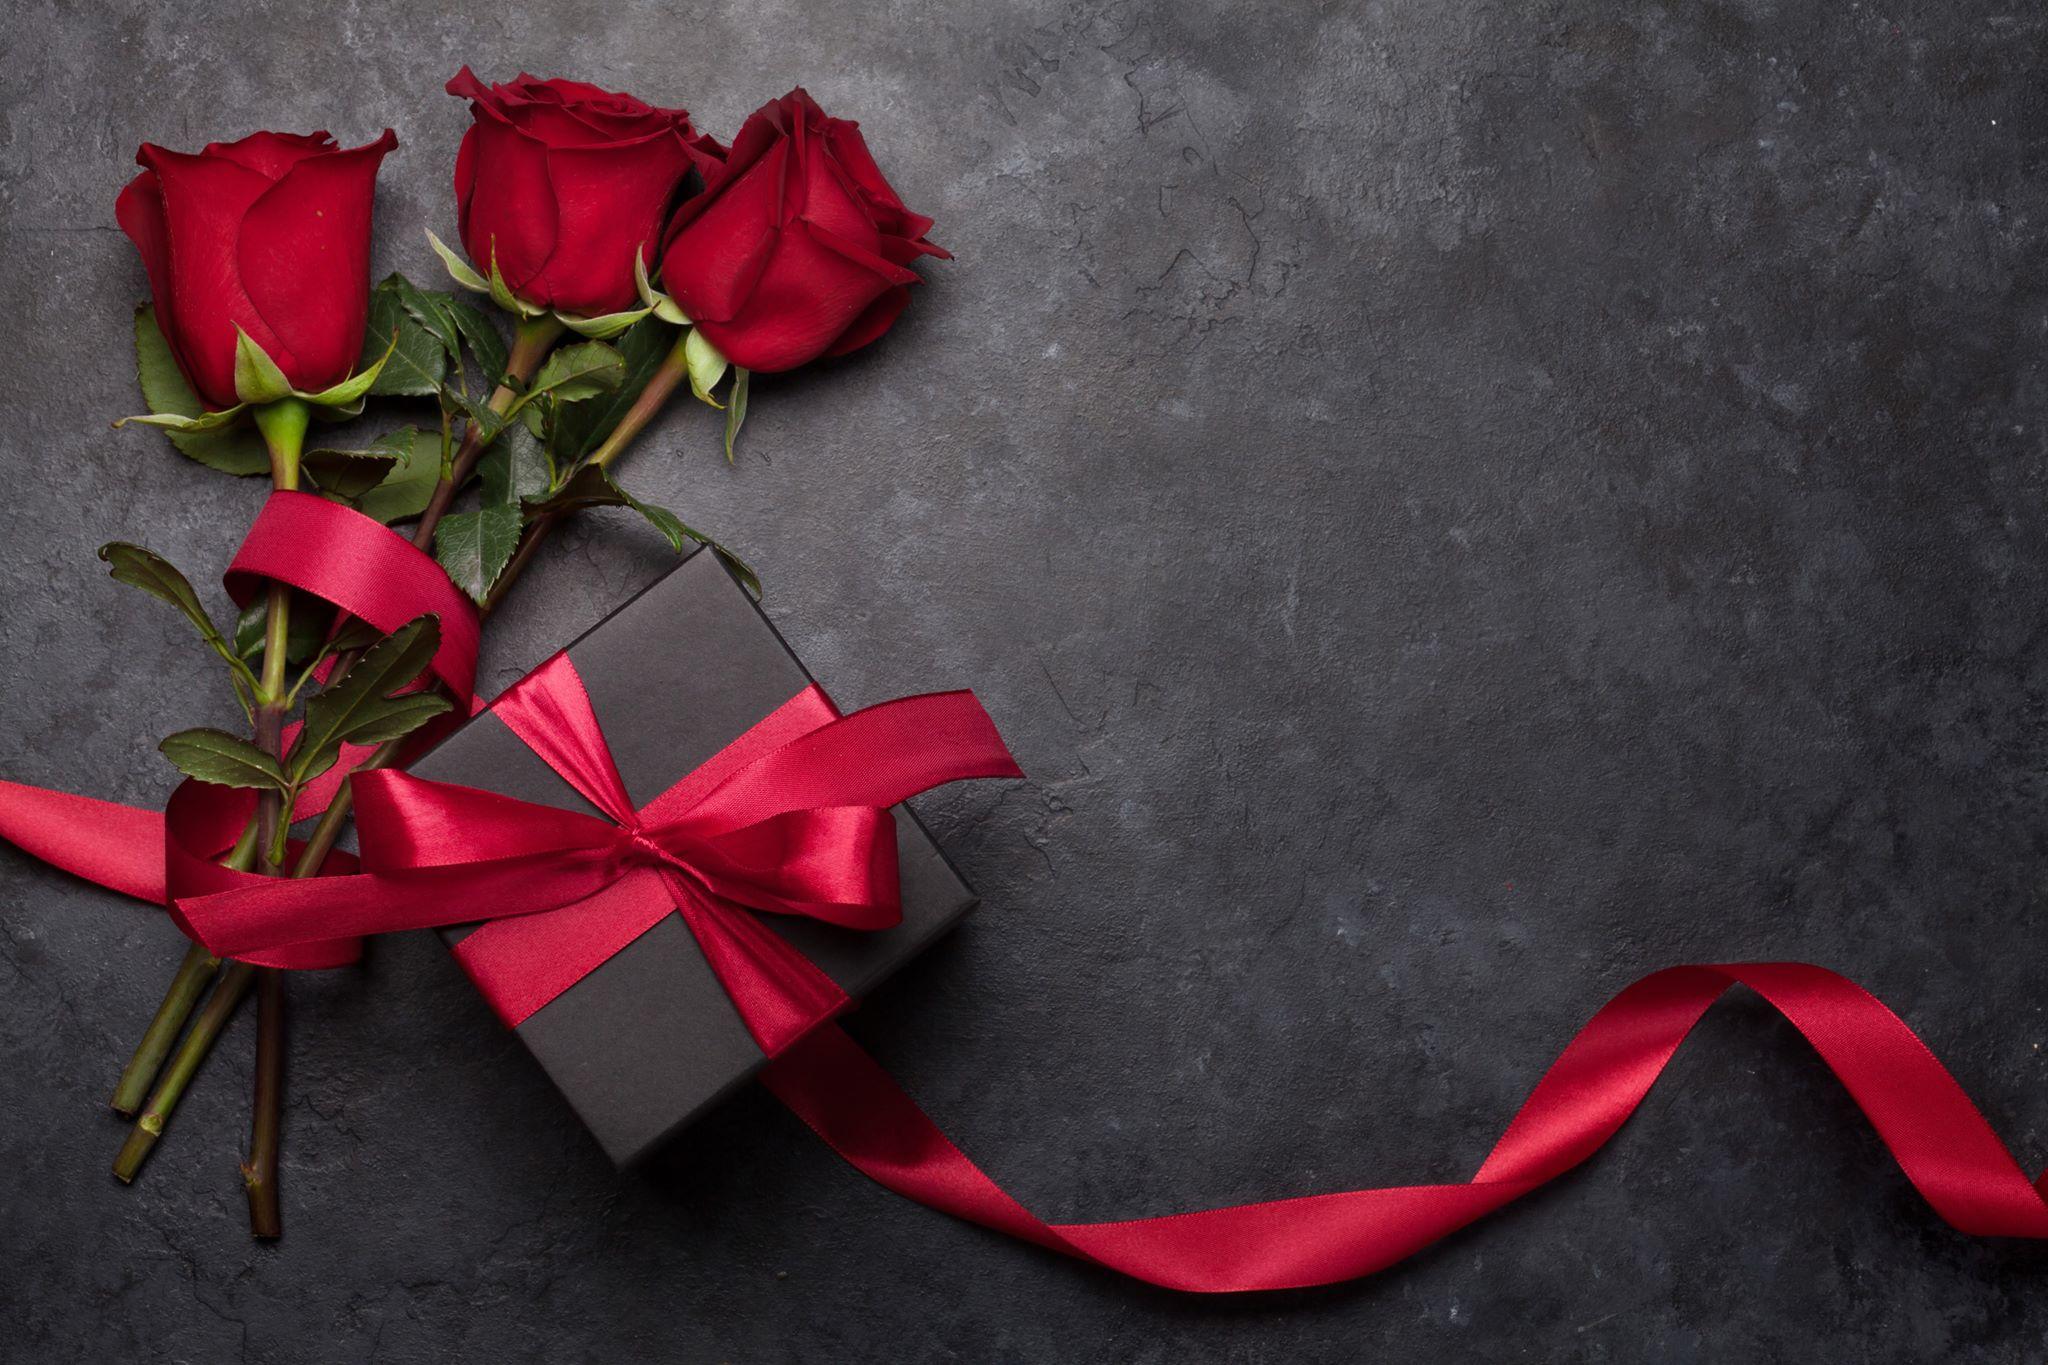 Valentines day images 15 صور عيد الحب